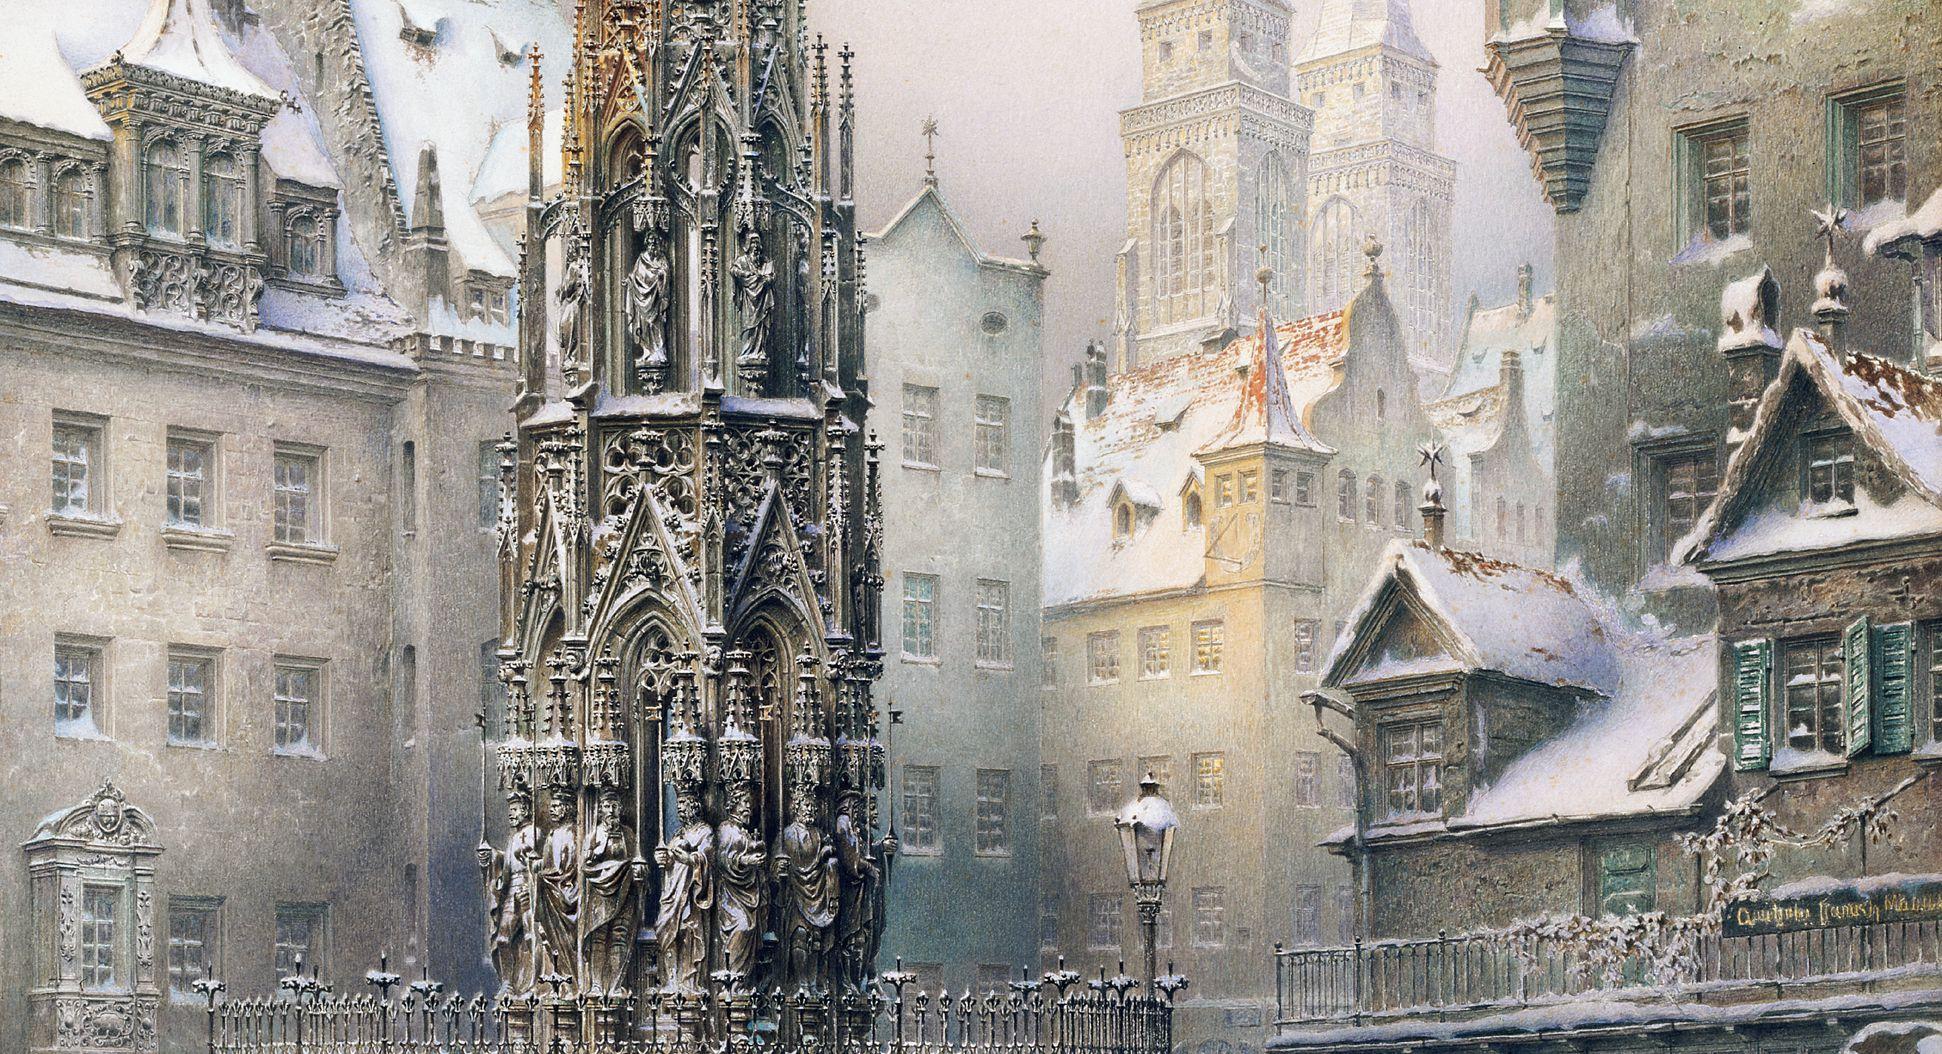 Christkindlesmarkt (Christmas market) with Beautiful Fountain View towards St. Sebaldus-Church